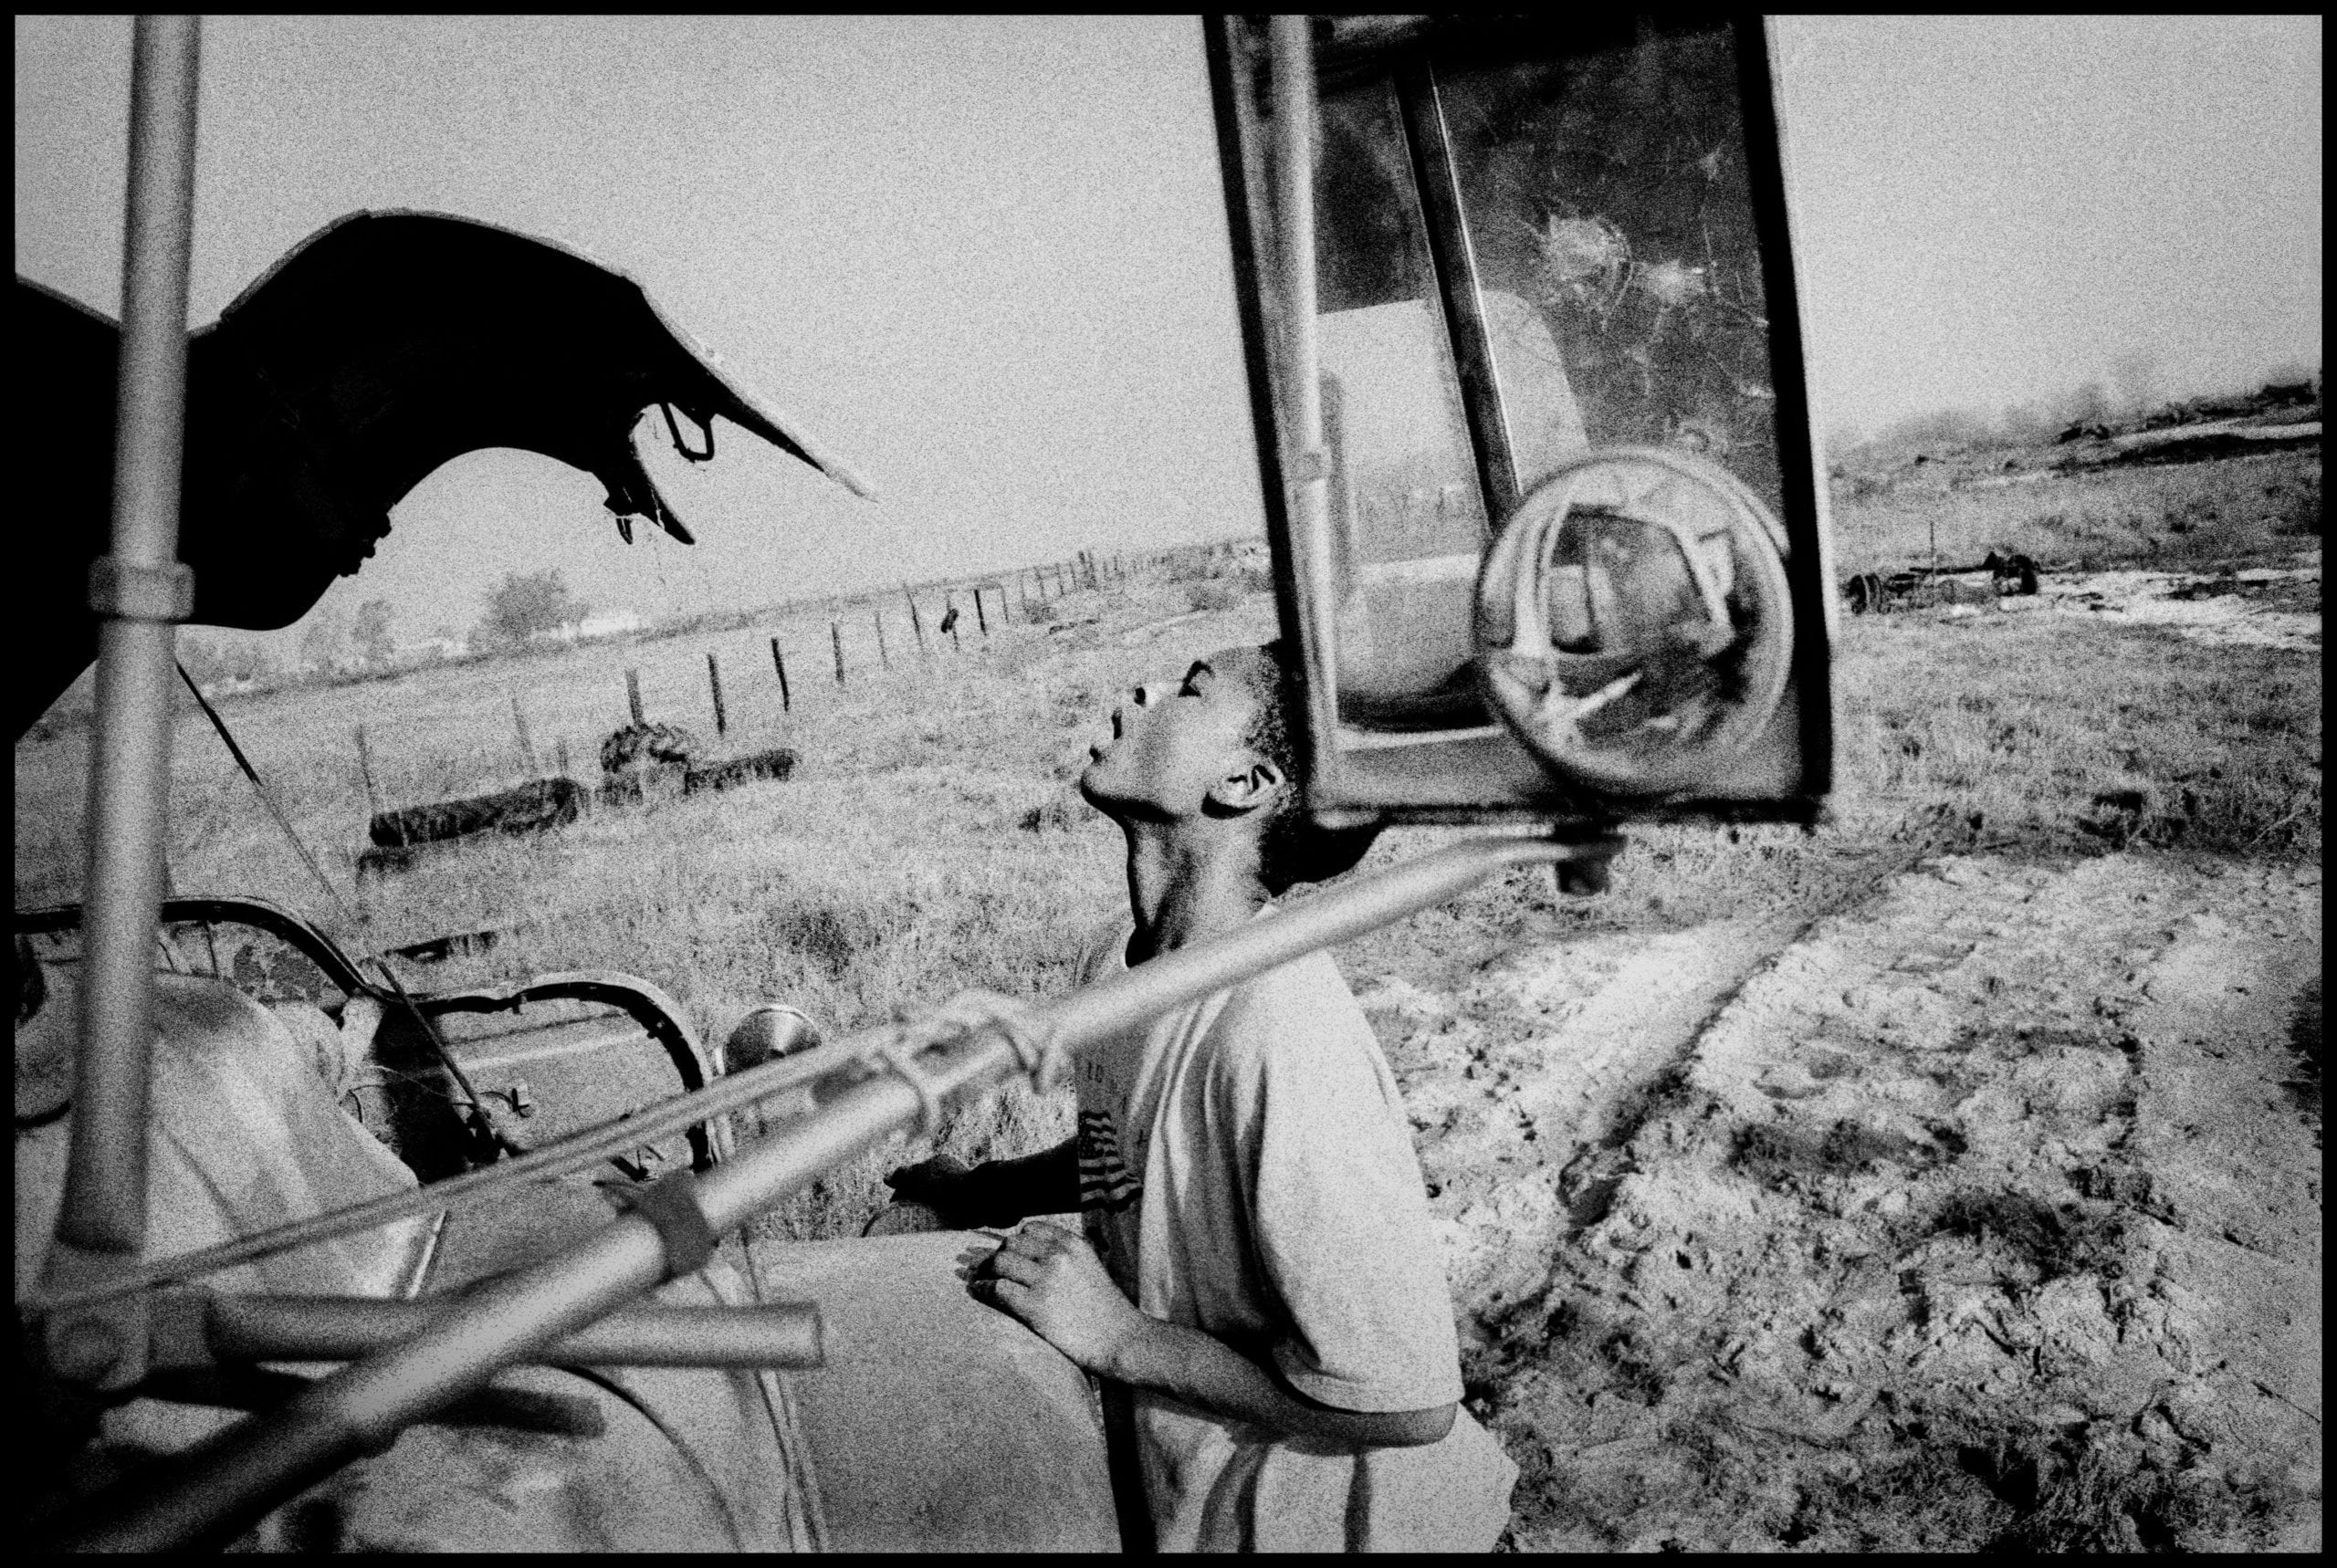 Matt blacks moral photography of americas sprawling poverty